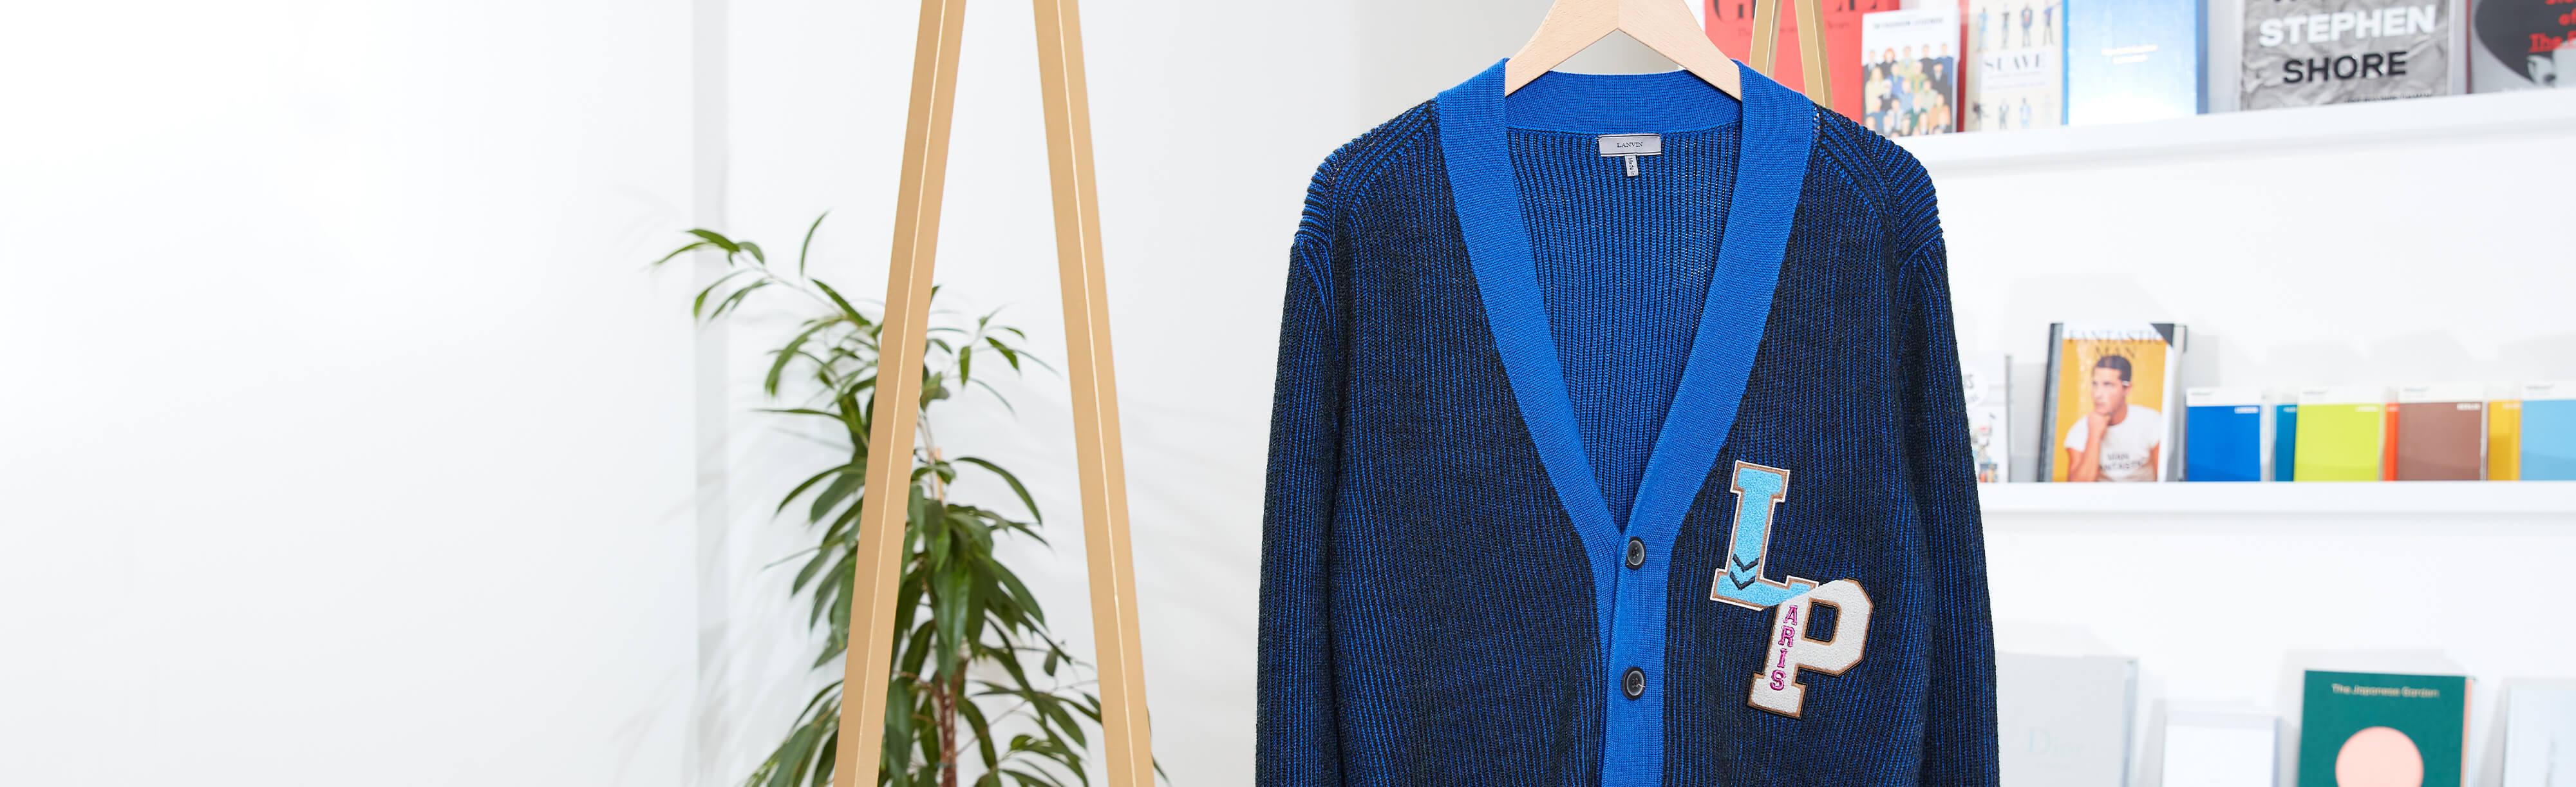 Lanvin men's clothing